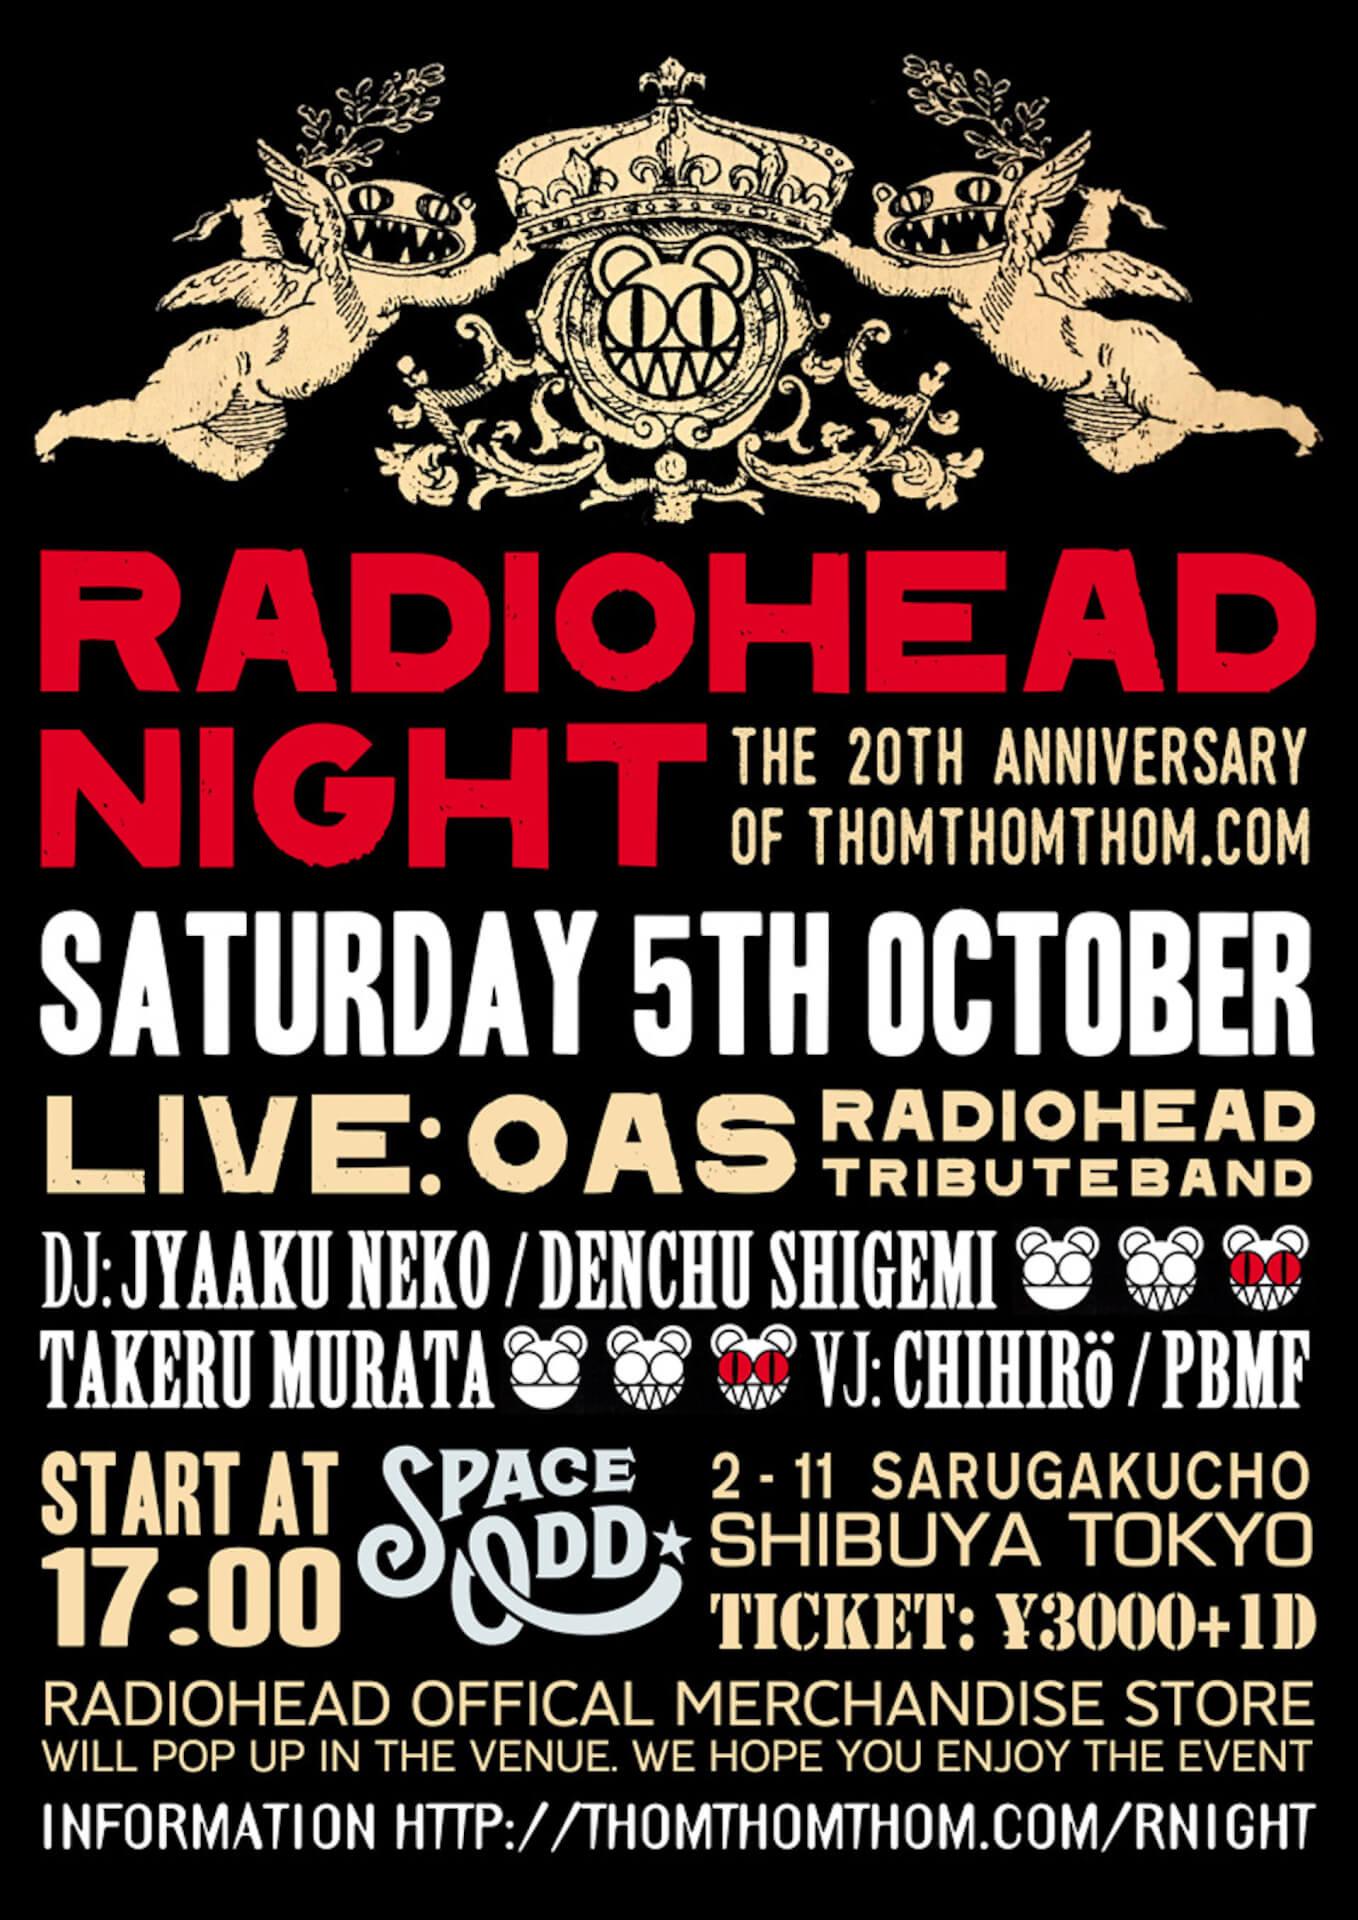 Radioheadトリビュートバンド・OASによる本家公認ファンイベントが渋谷で開催|Radioheadファン悶絶の直筆メッセージなども展示 music190928_radioheadnight_main